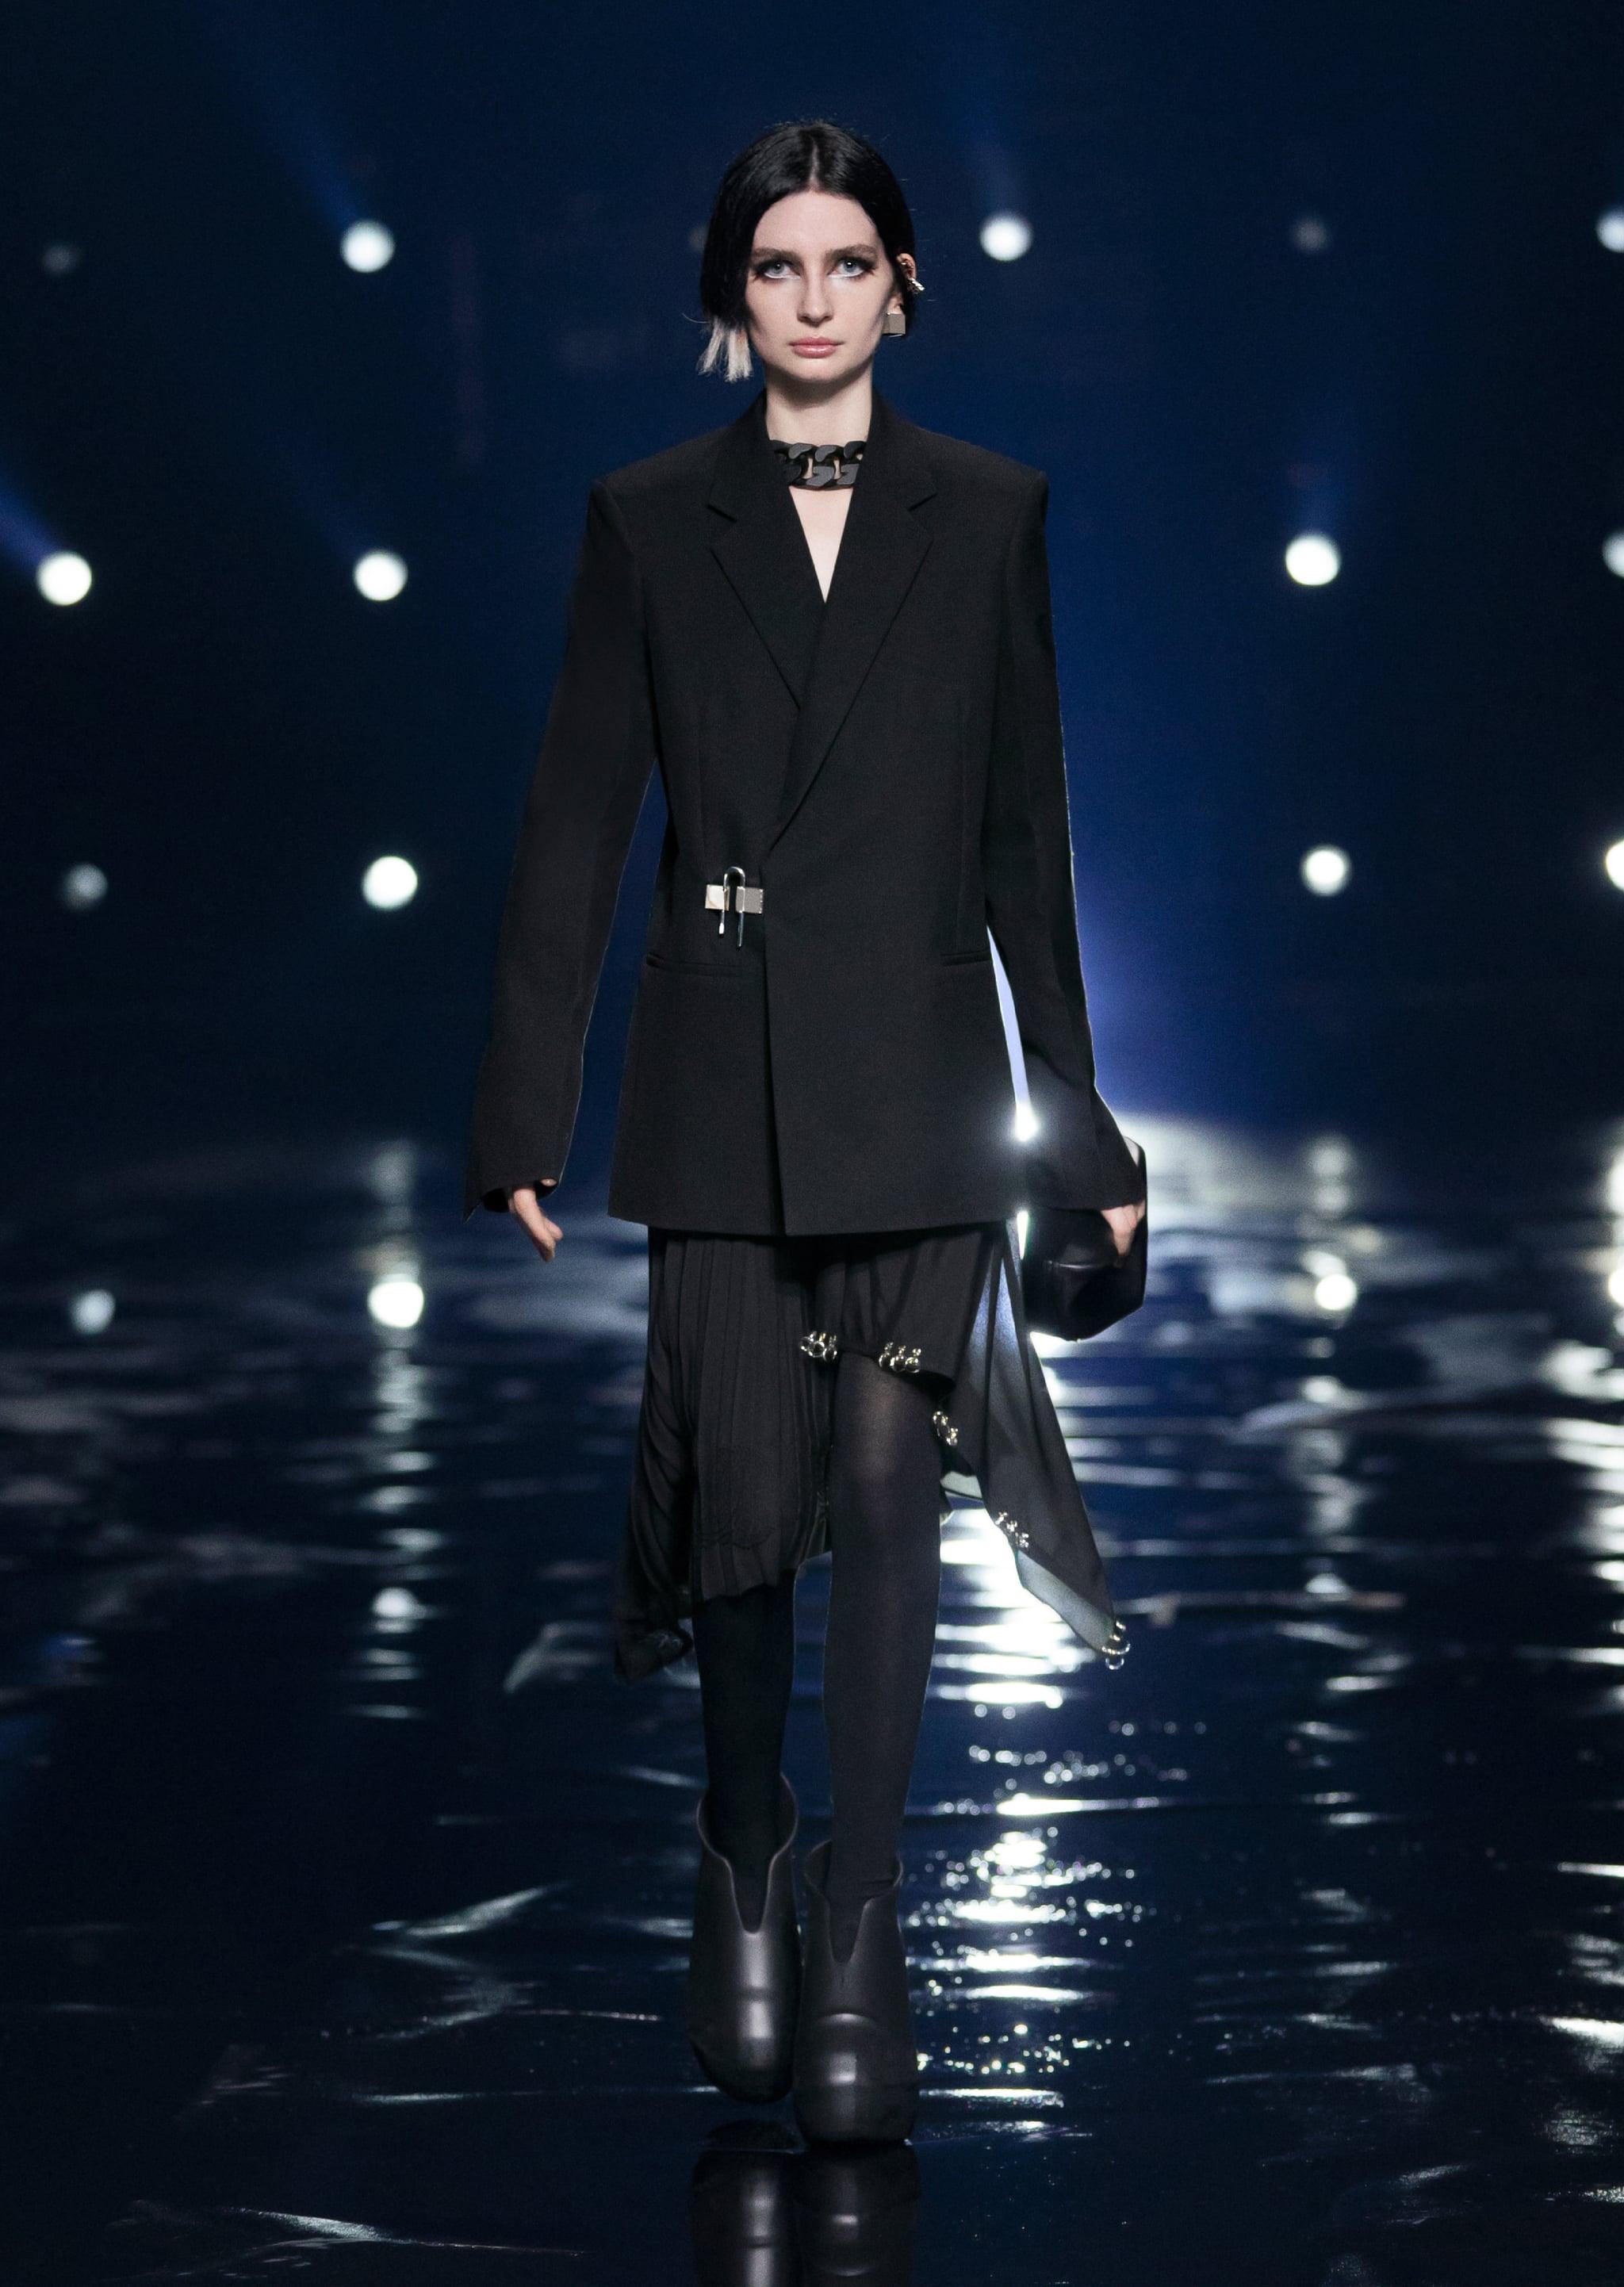 Paul Walker's Daughter, Meadow, Just Made Her Runway Debut | POPSUGAR  Fashion